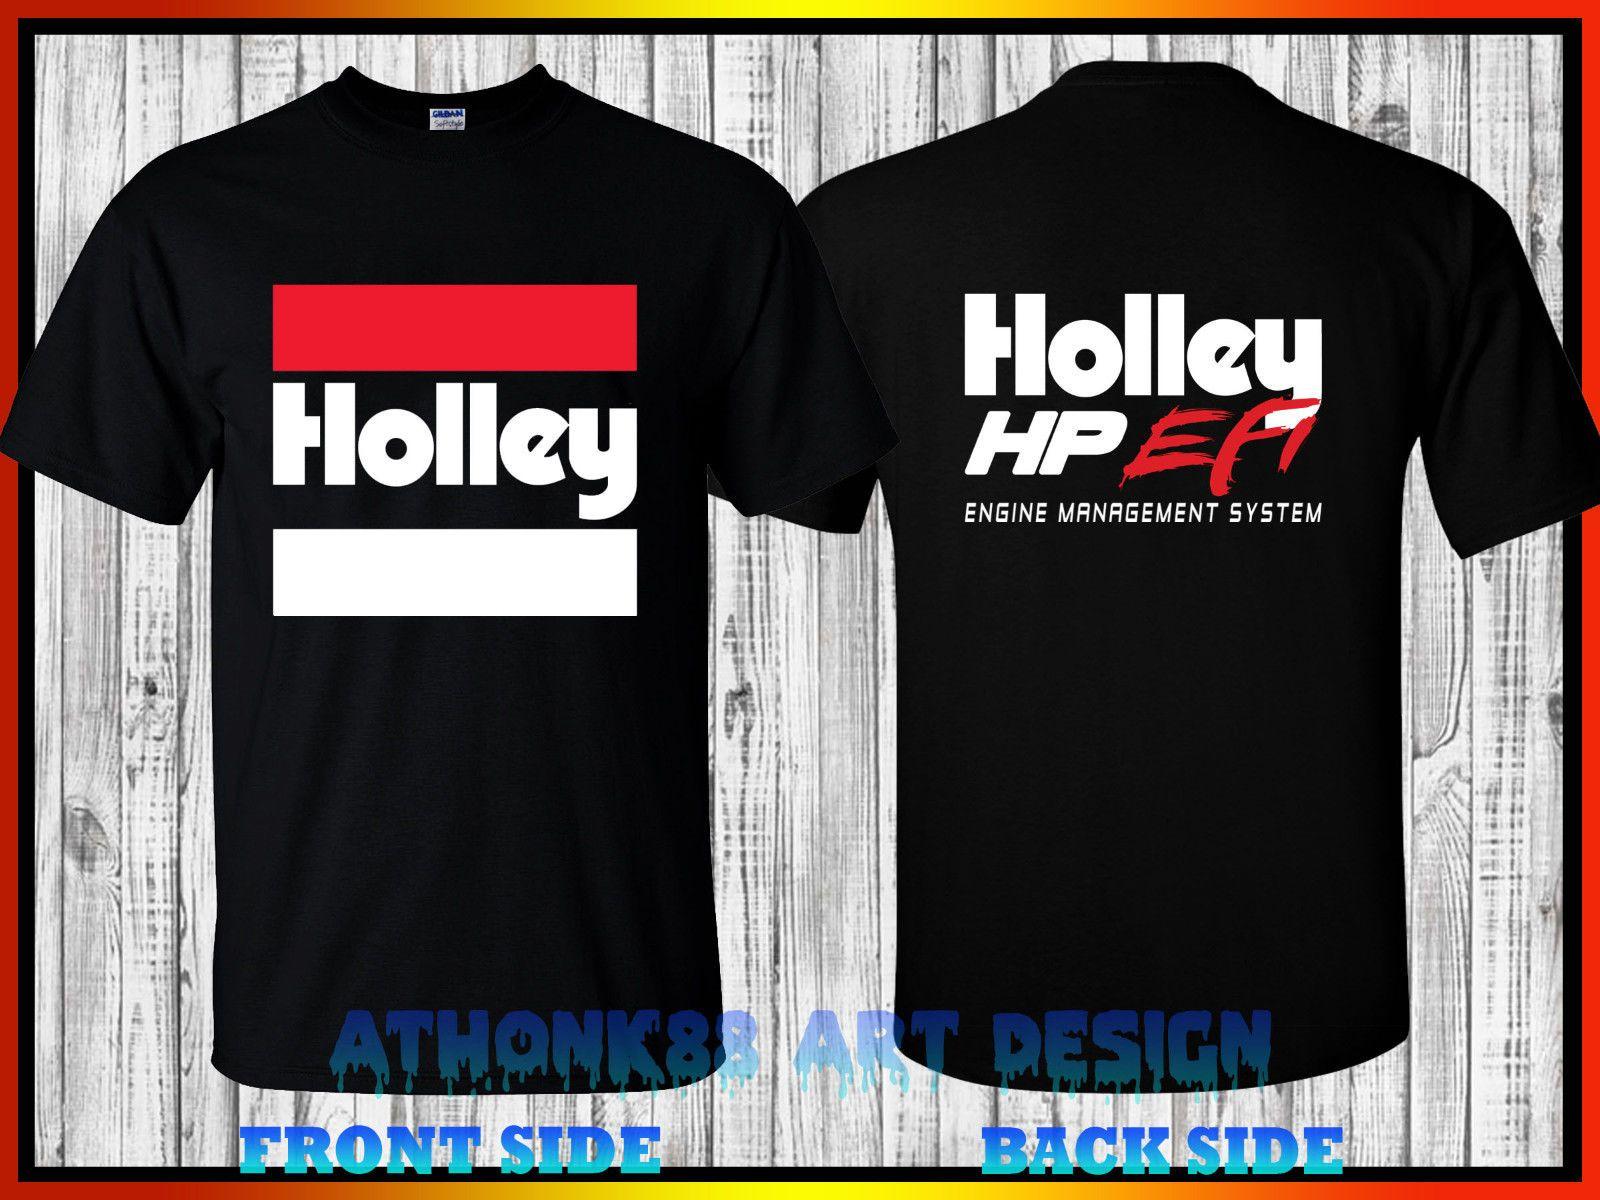 HOLLEY HP EFI T-SHIRT HOLLEY HP EFI ENGINE MANAGEMENT SYSTEM T-SHIRT O-Neck  T Shirt Casual O-Neck Print Tops t shirts Men